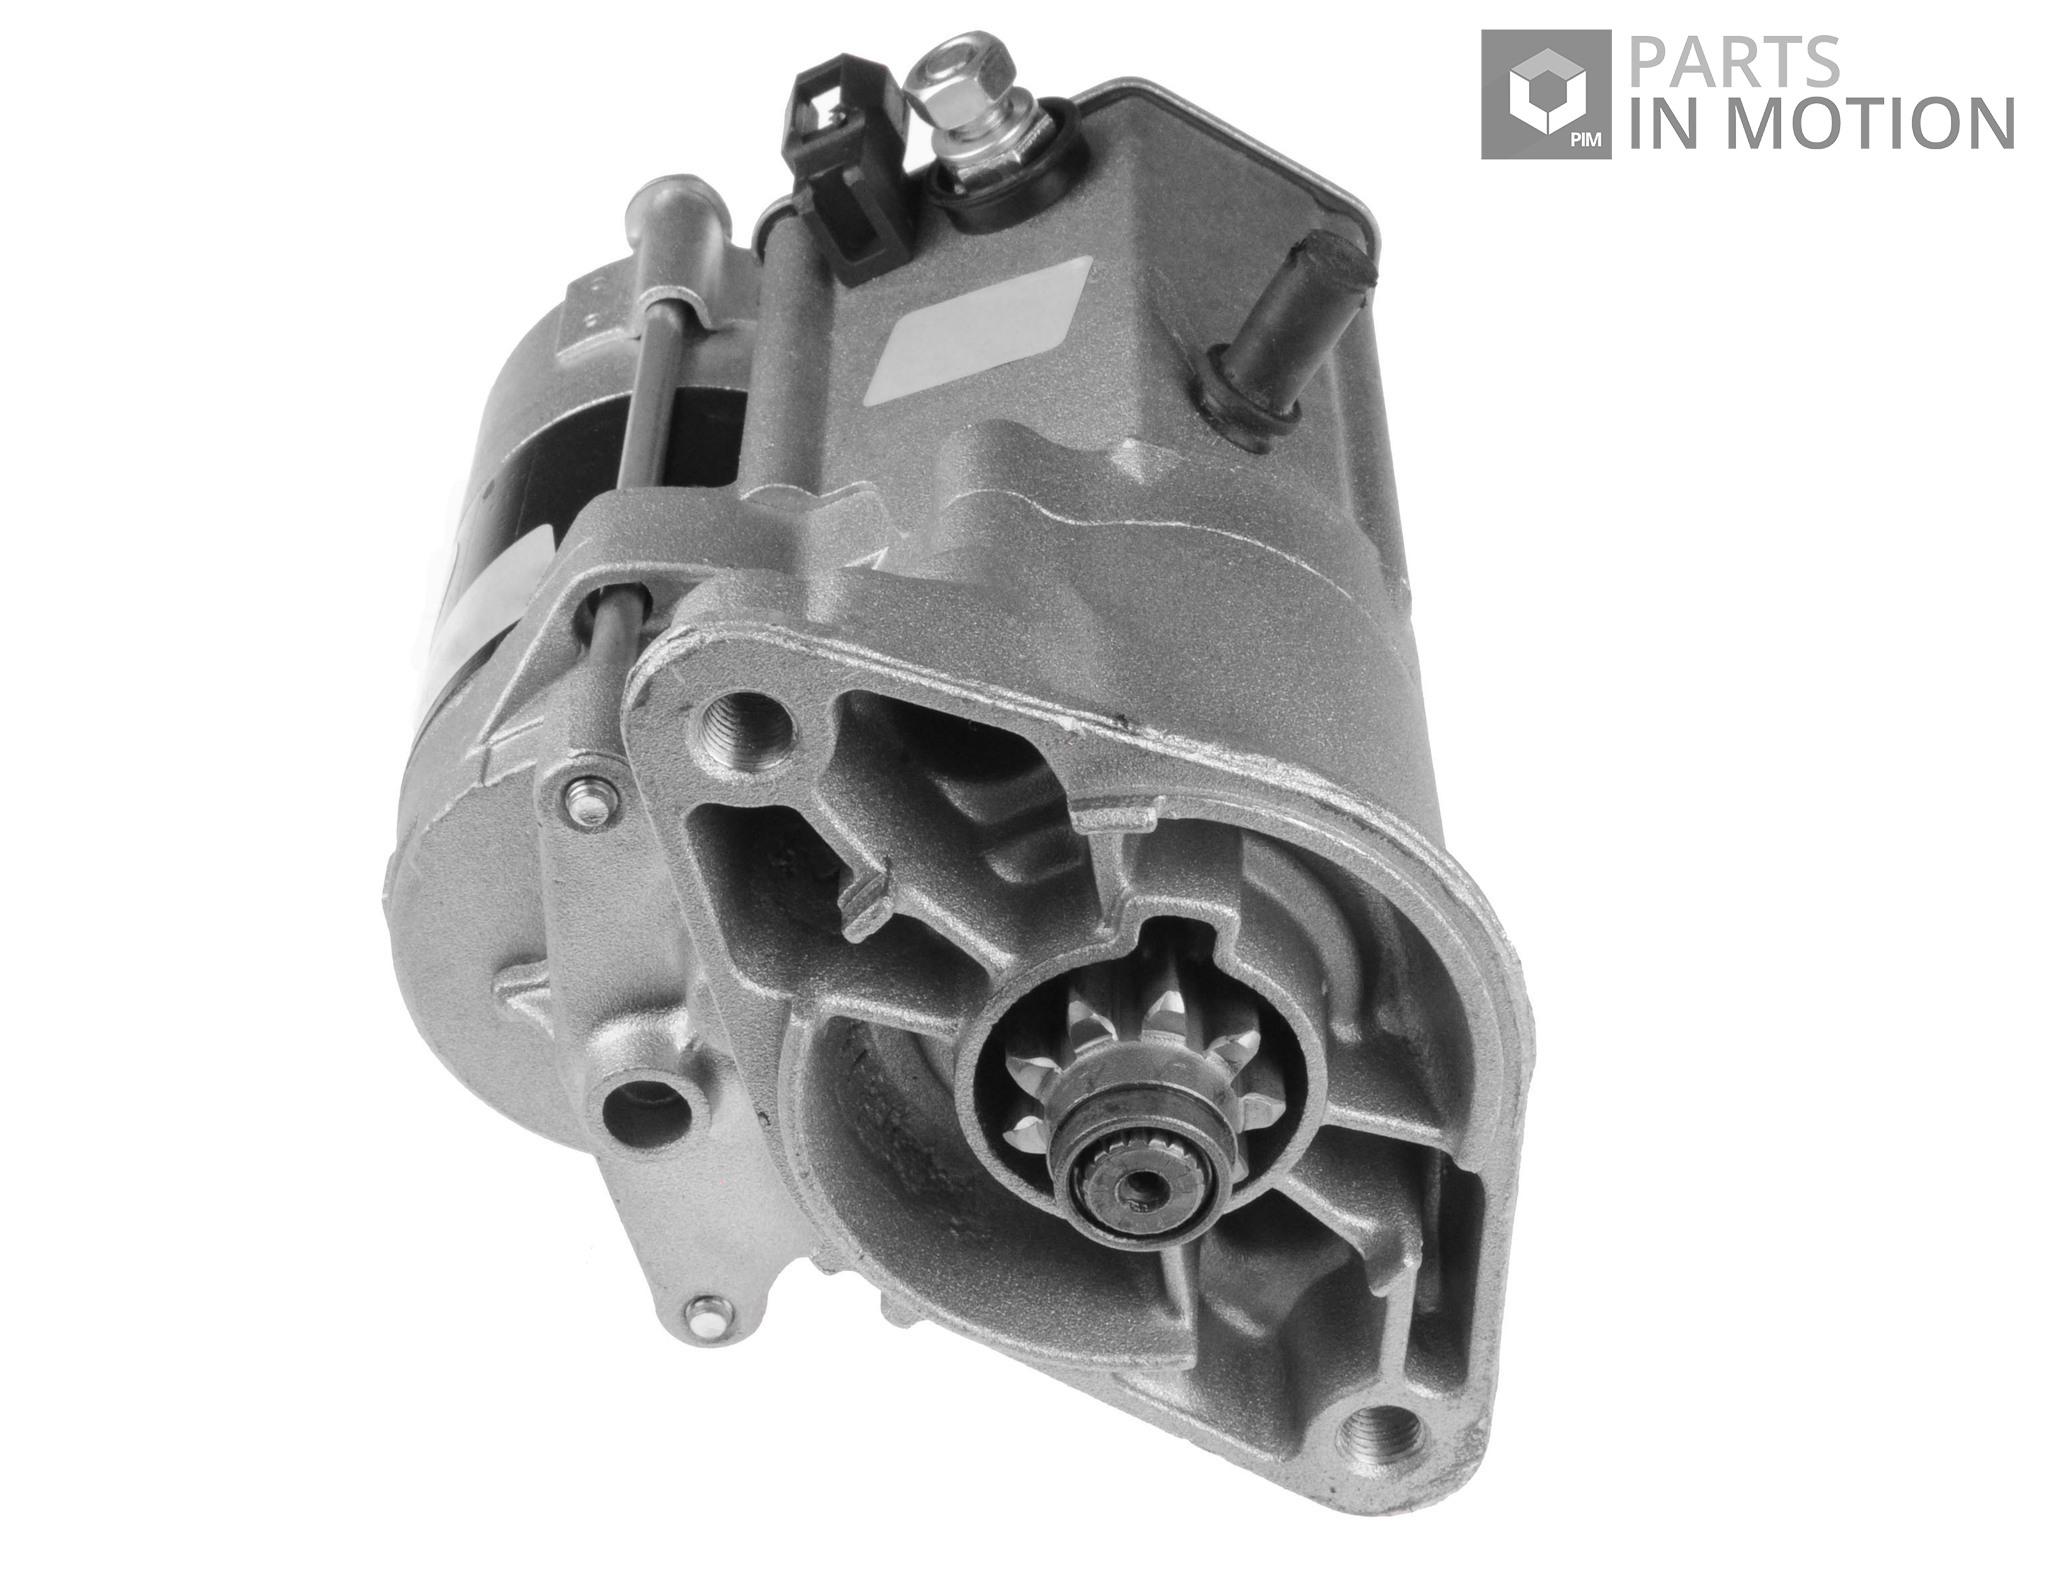 Starter motor fits toyota starlet 13 89 to 96 adl 2810010040 blue print starter motor adt31214 malvernweather Choice Image